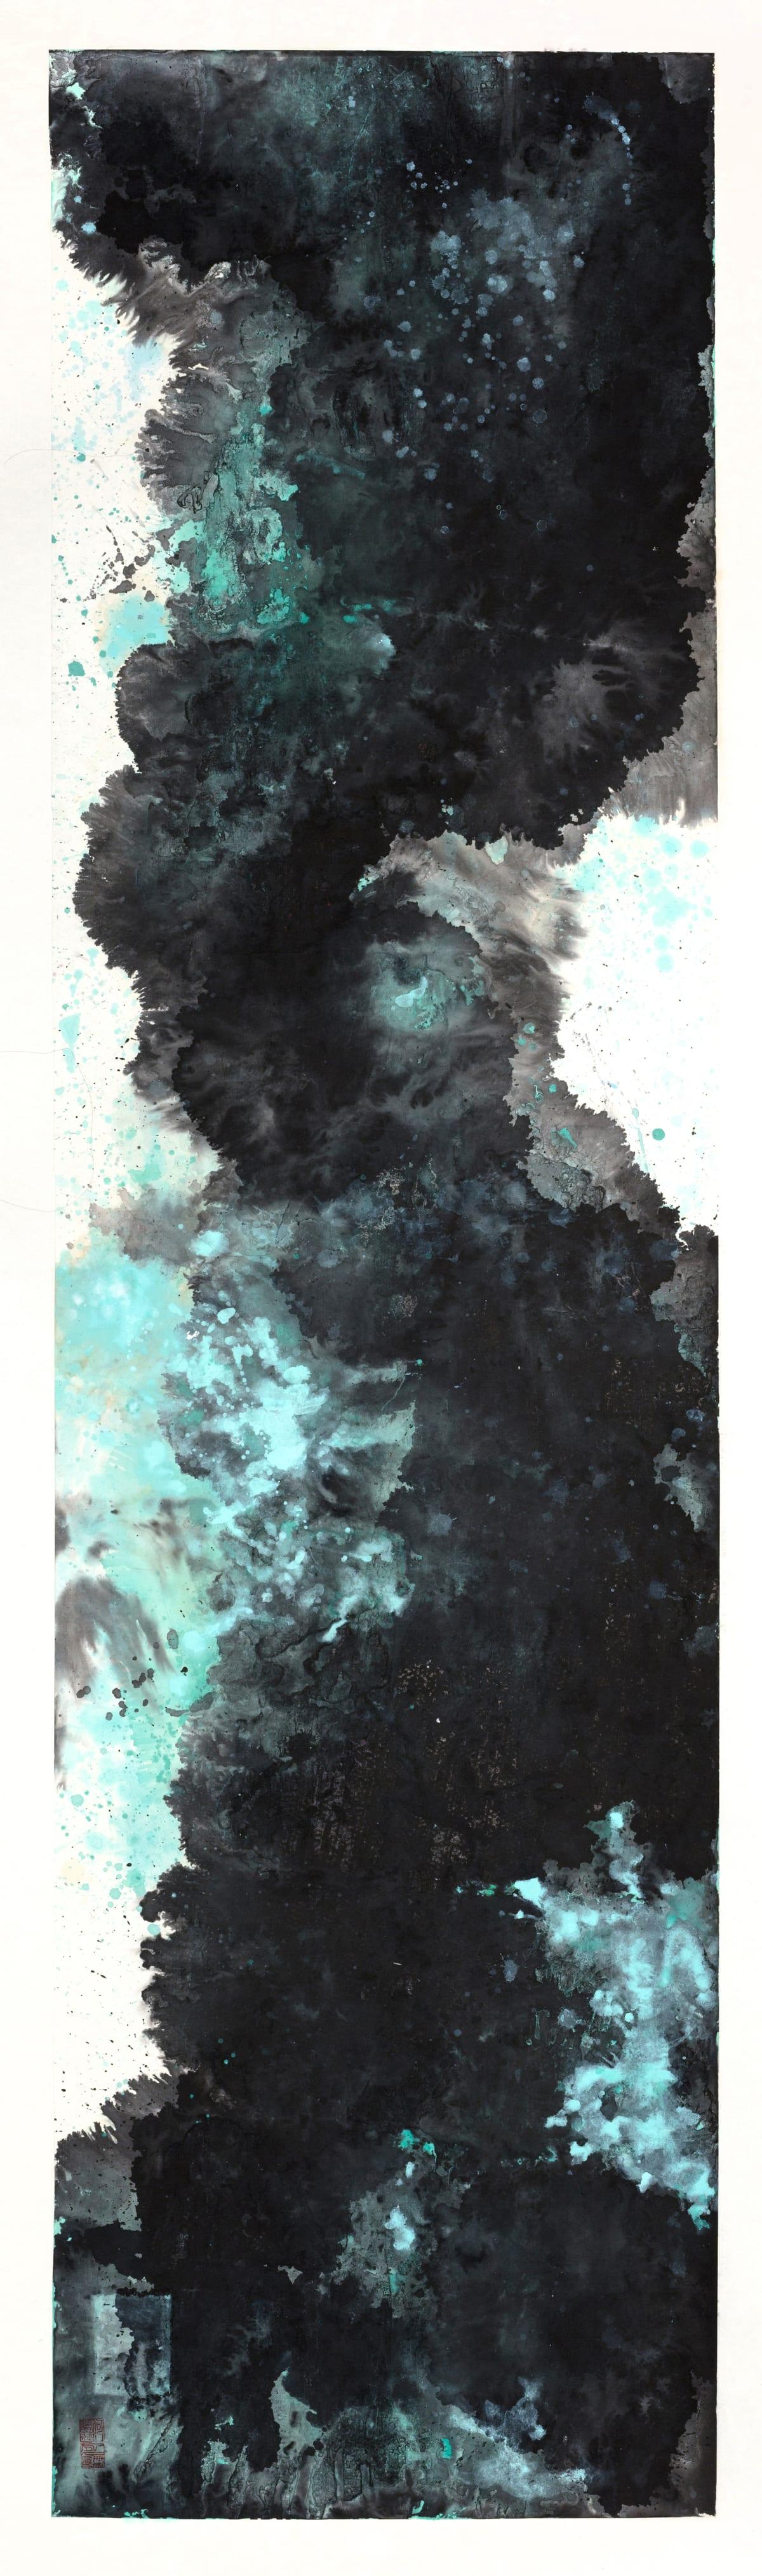 Chloe Ho 何鳳蓮, Parallel Universe 1, 2016